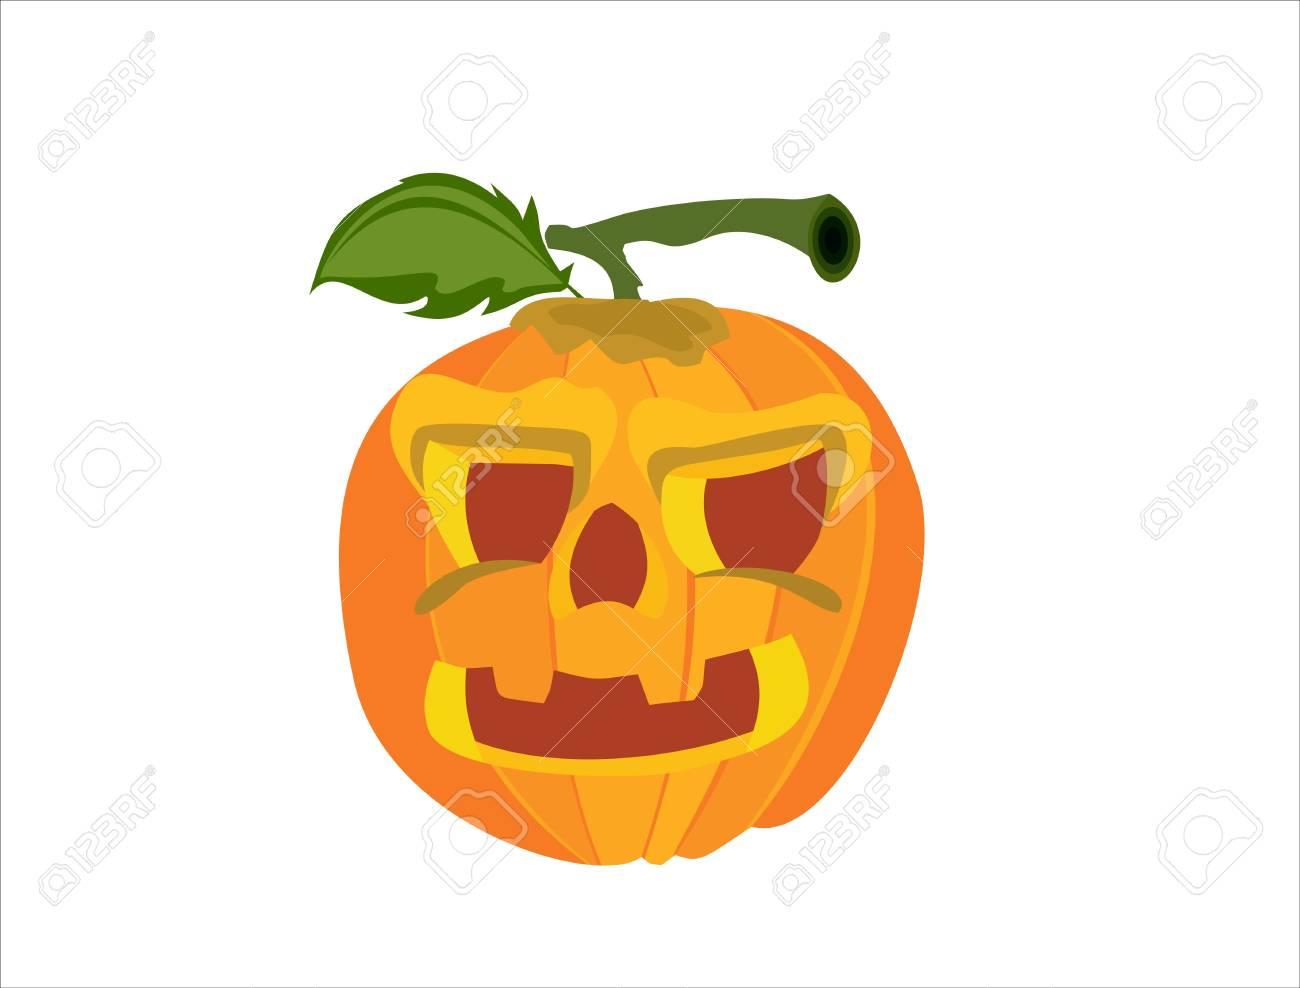 Pumpkin on Halloween Stock Vector - 14199193